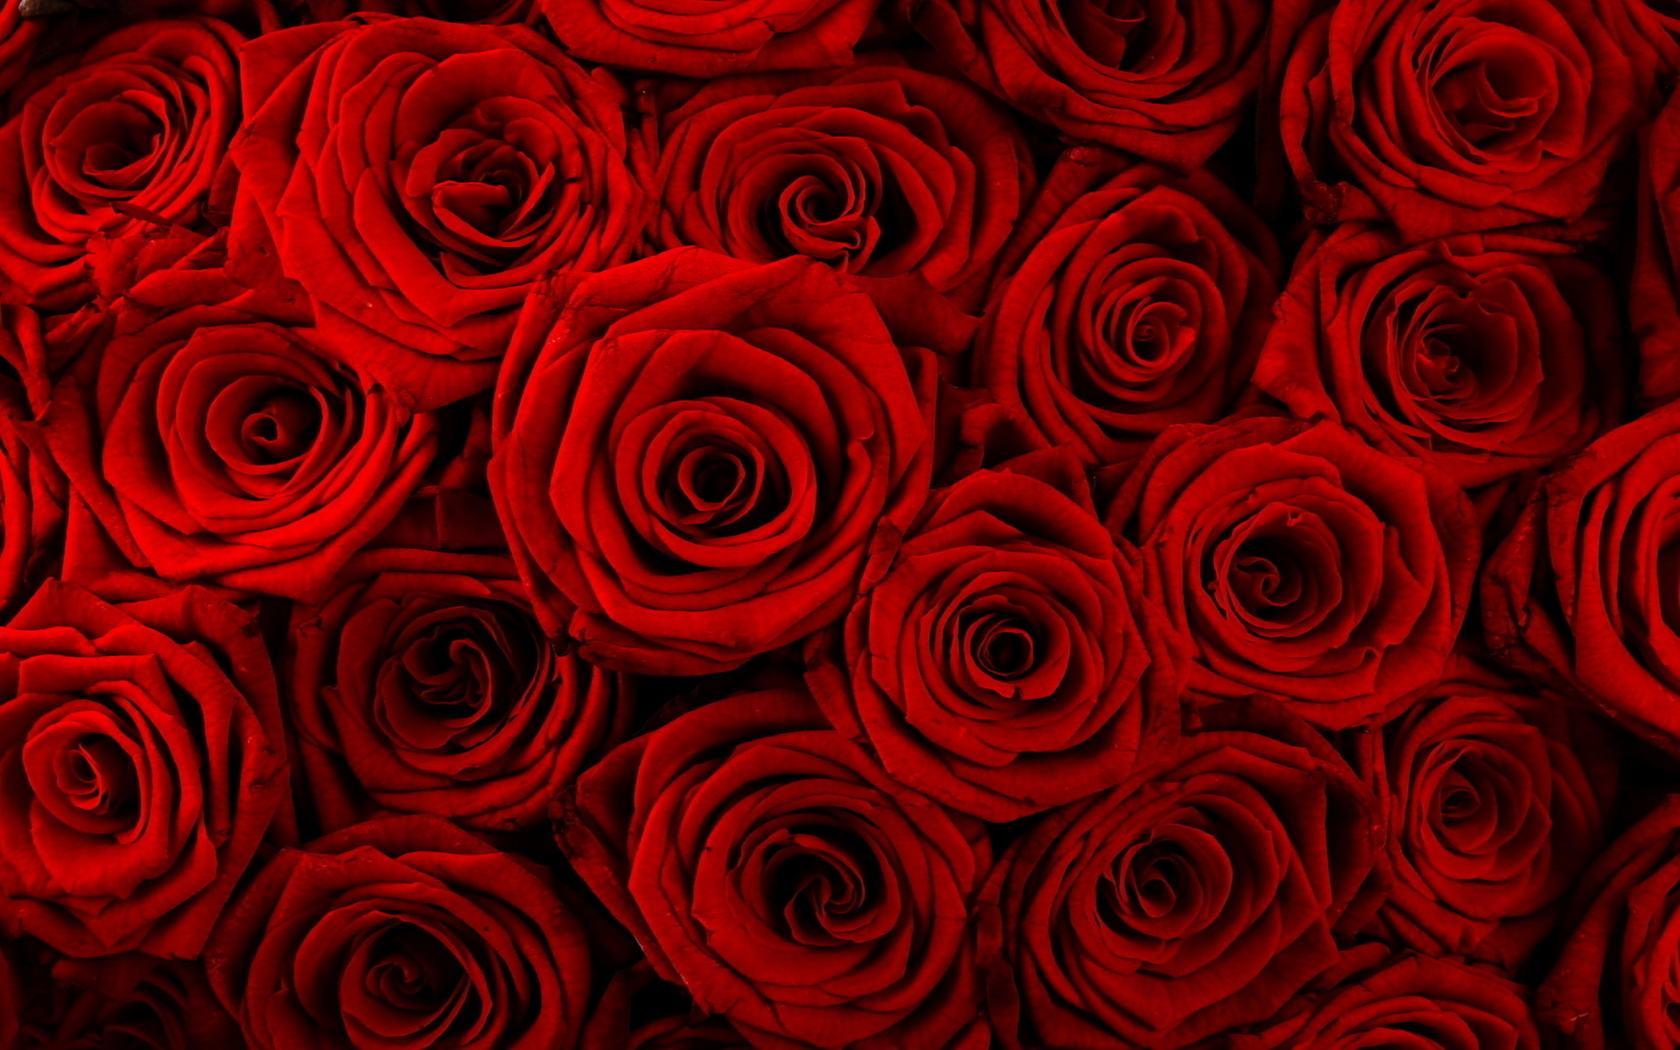 Sant Jordi: roses i espines